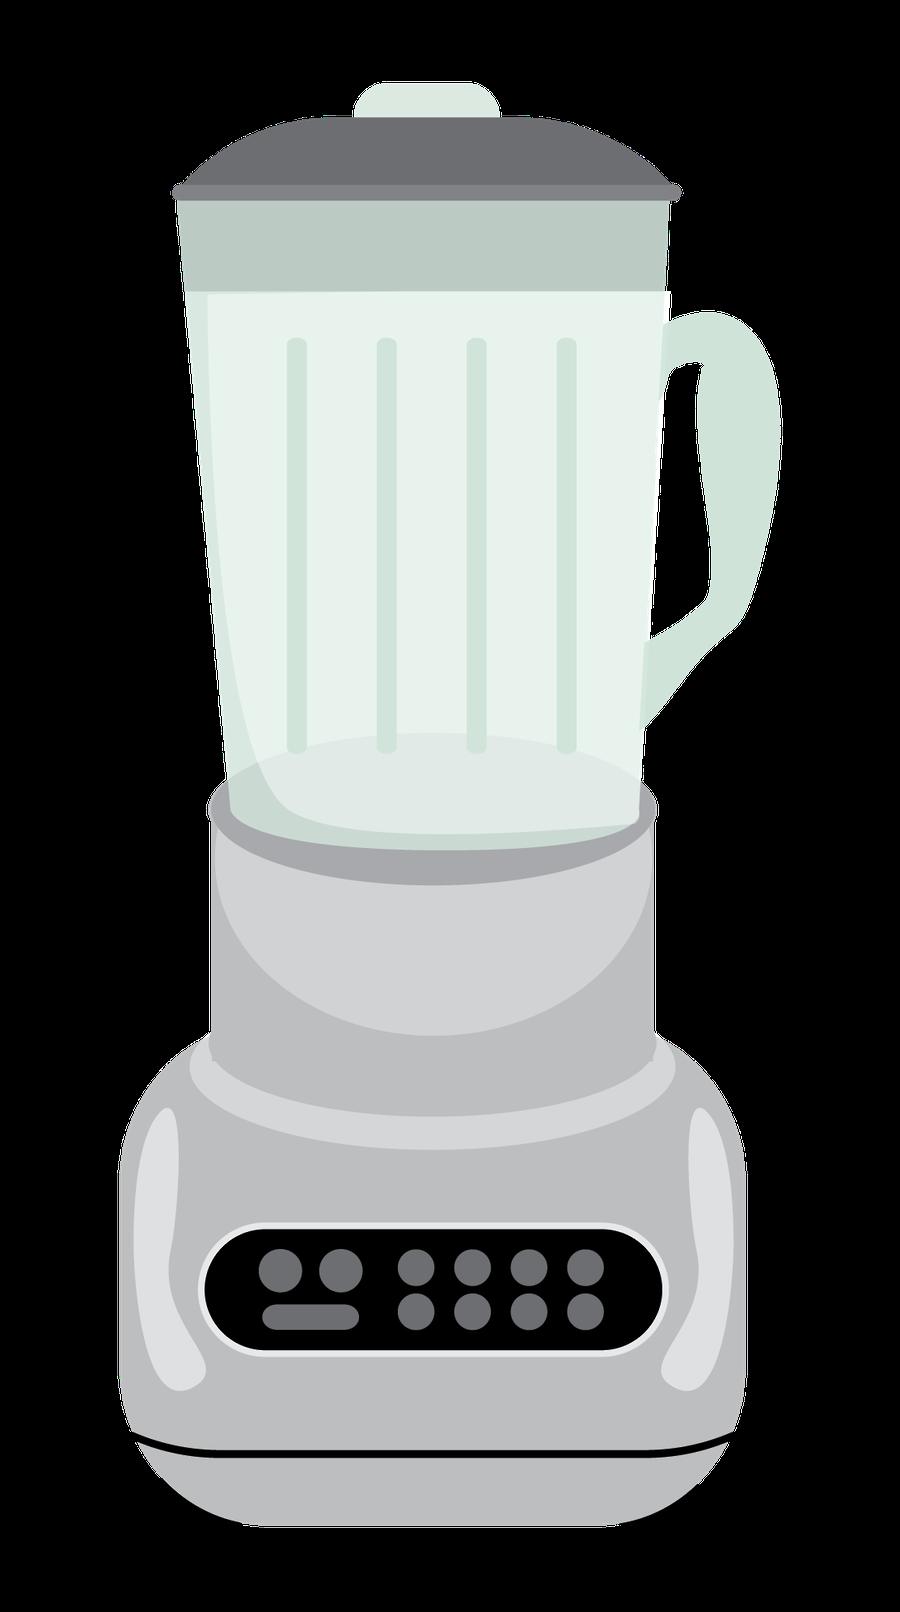 Kitchen clipart blender. Minus say hello silhouette